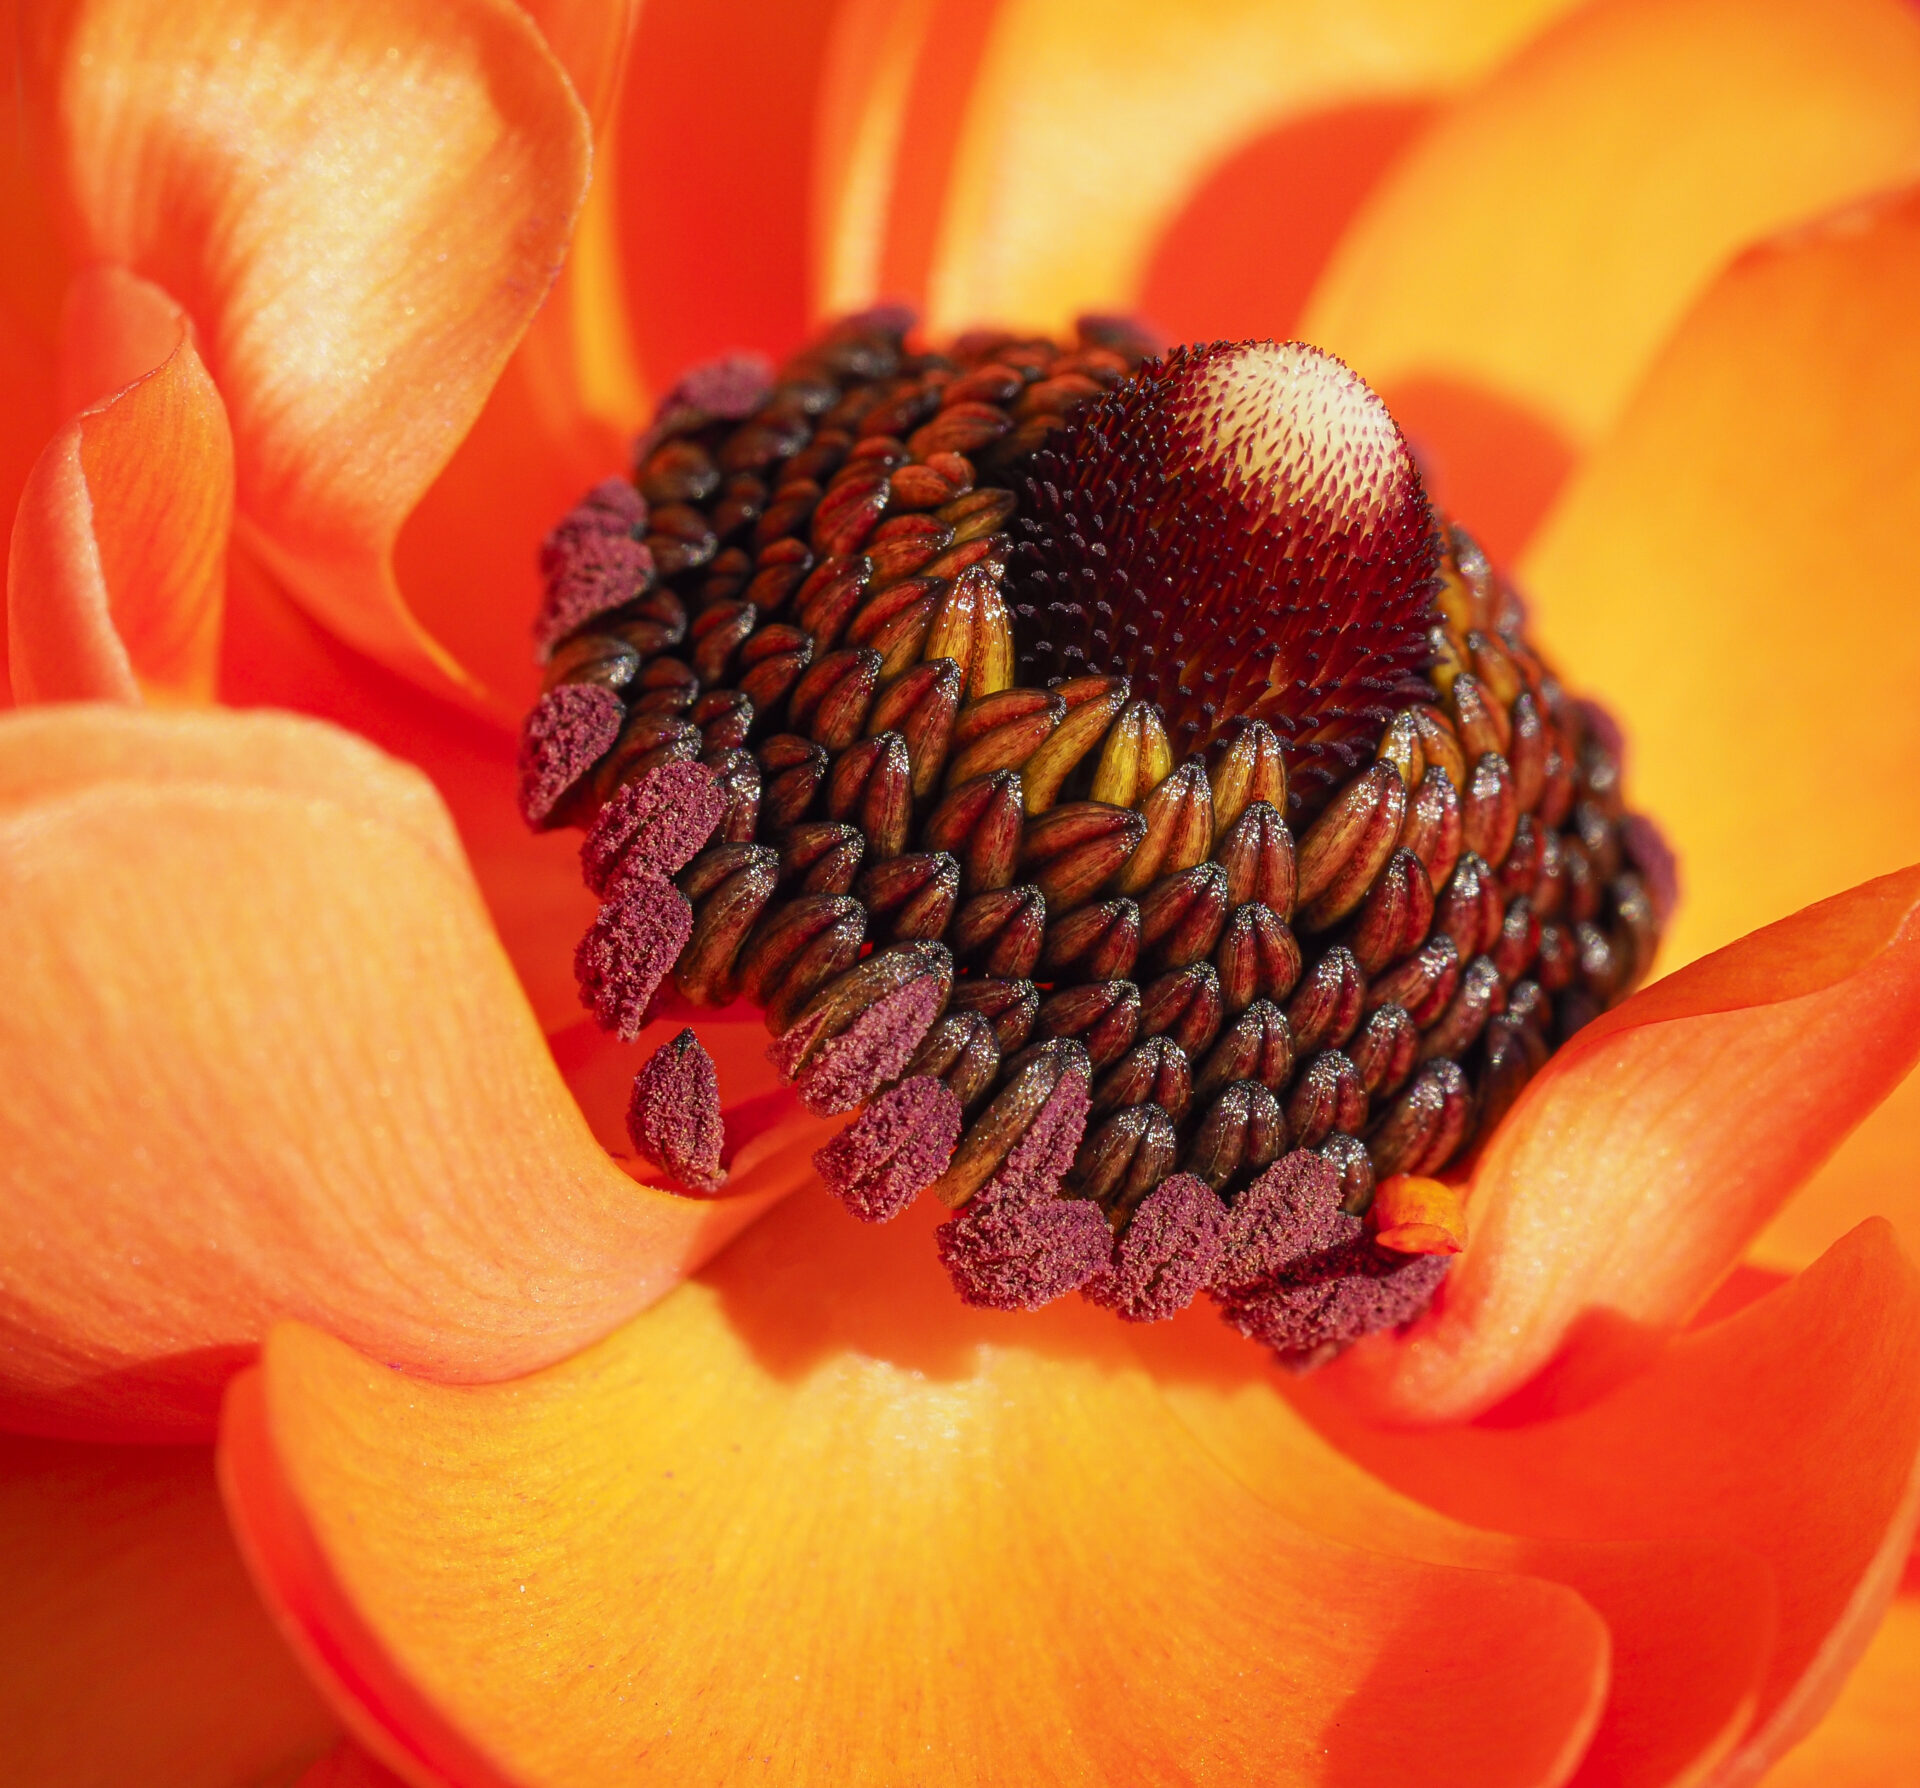 Close-Up photo of an orange flower